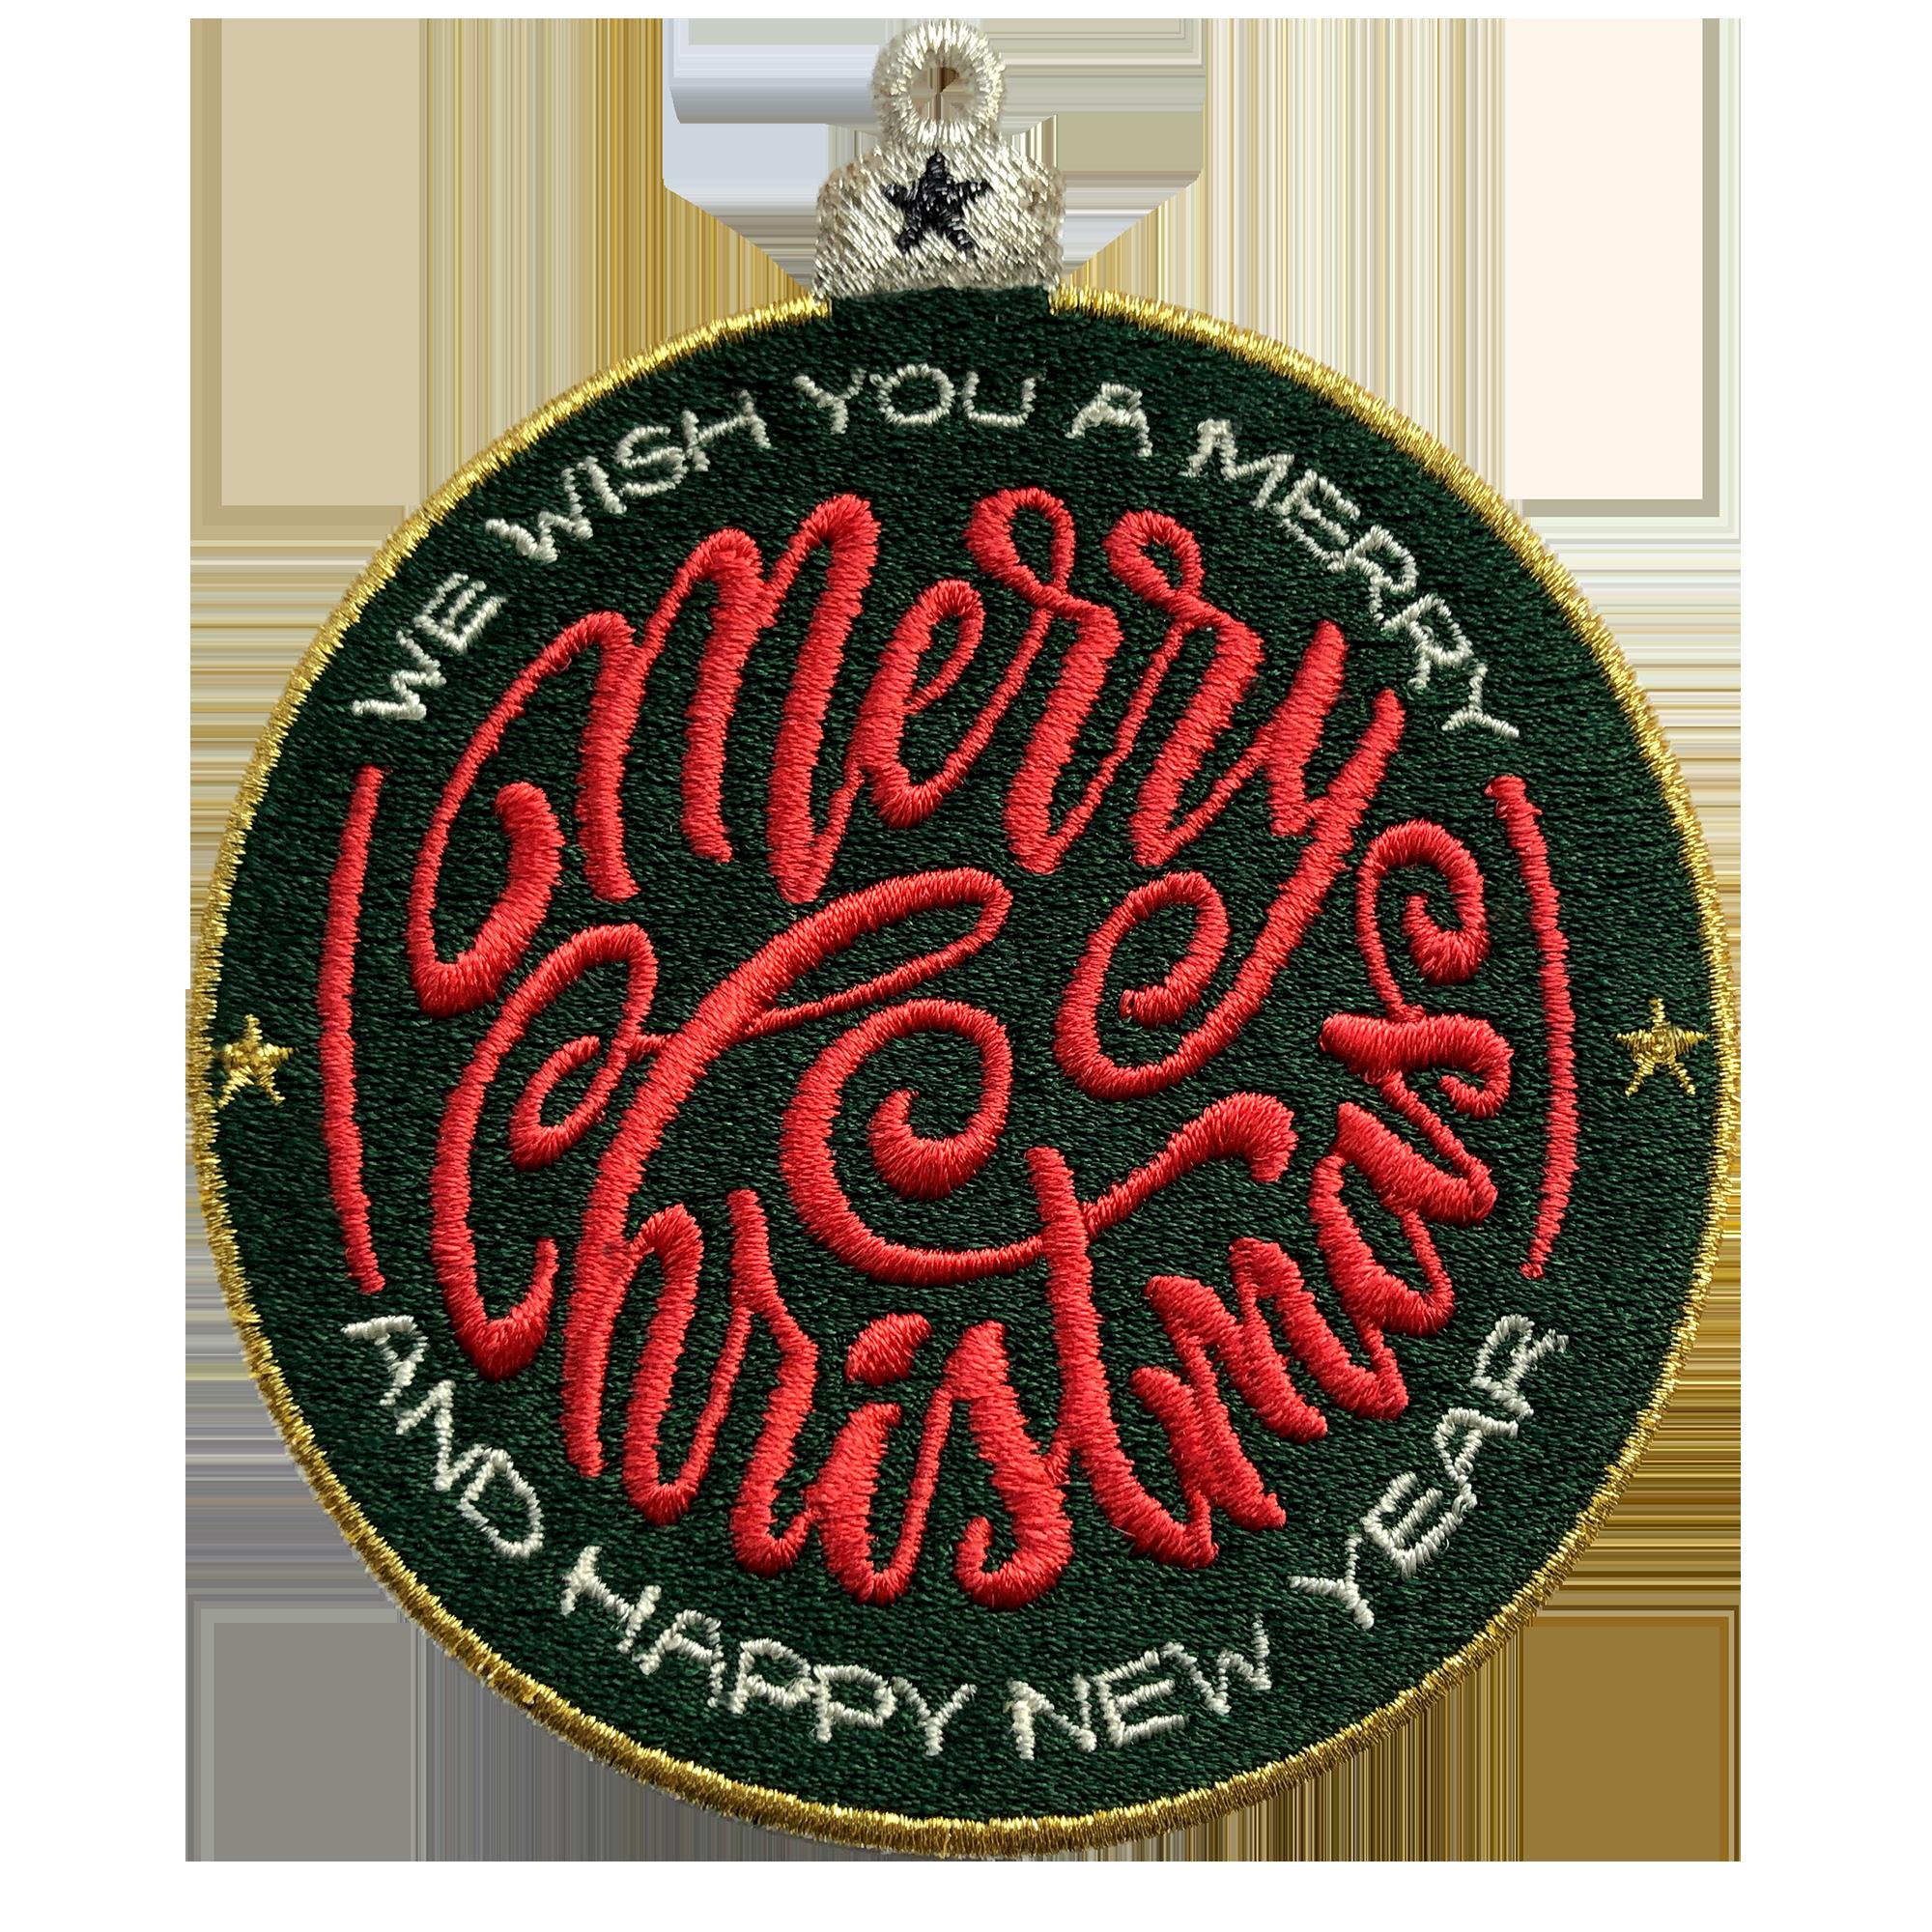 Label MERRY CHRISTMAS